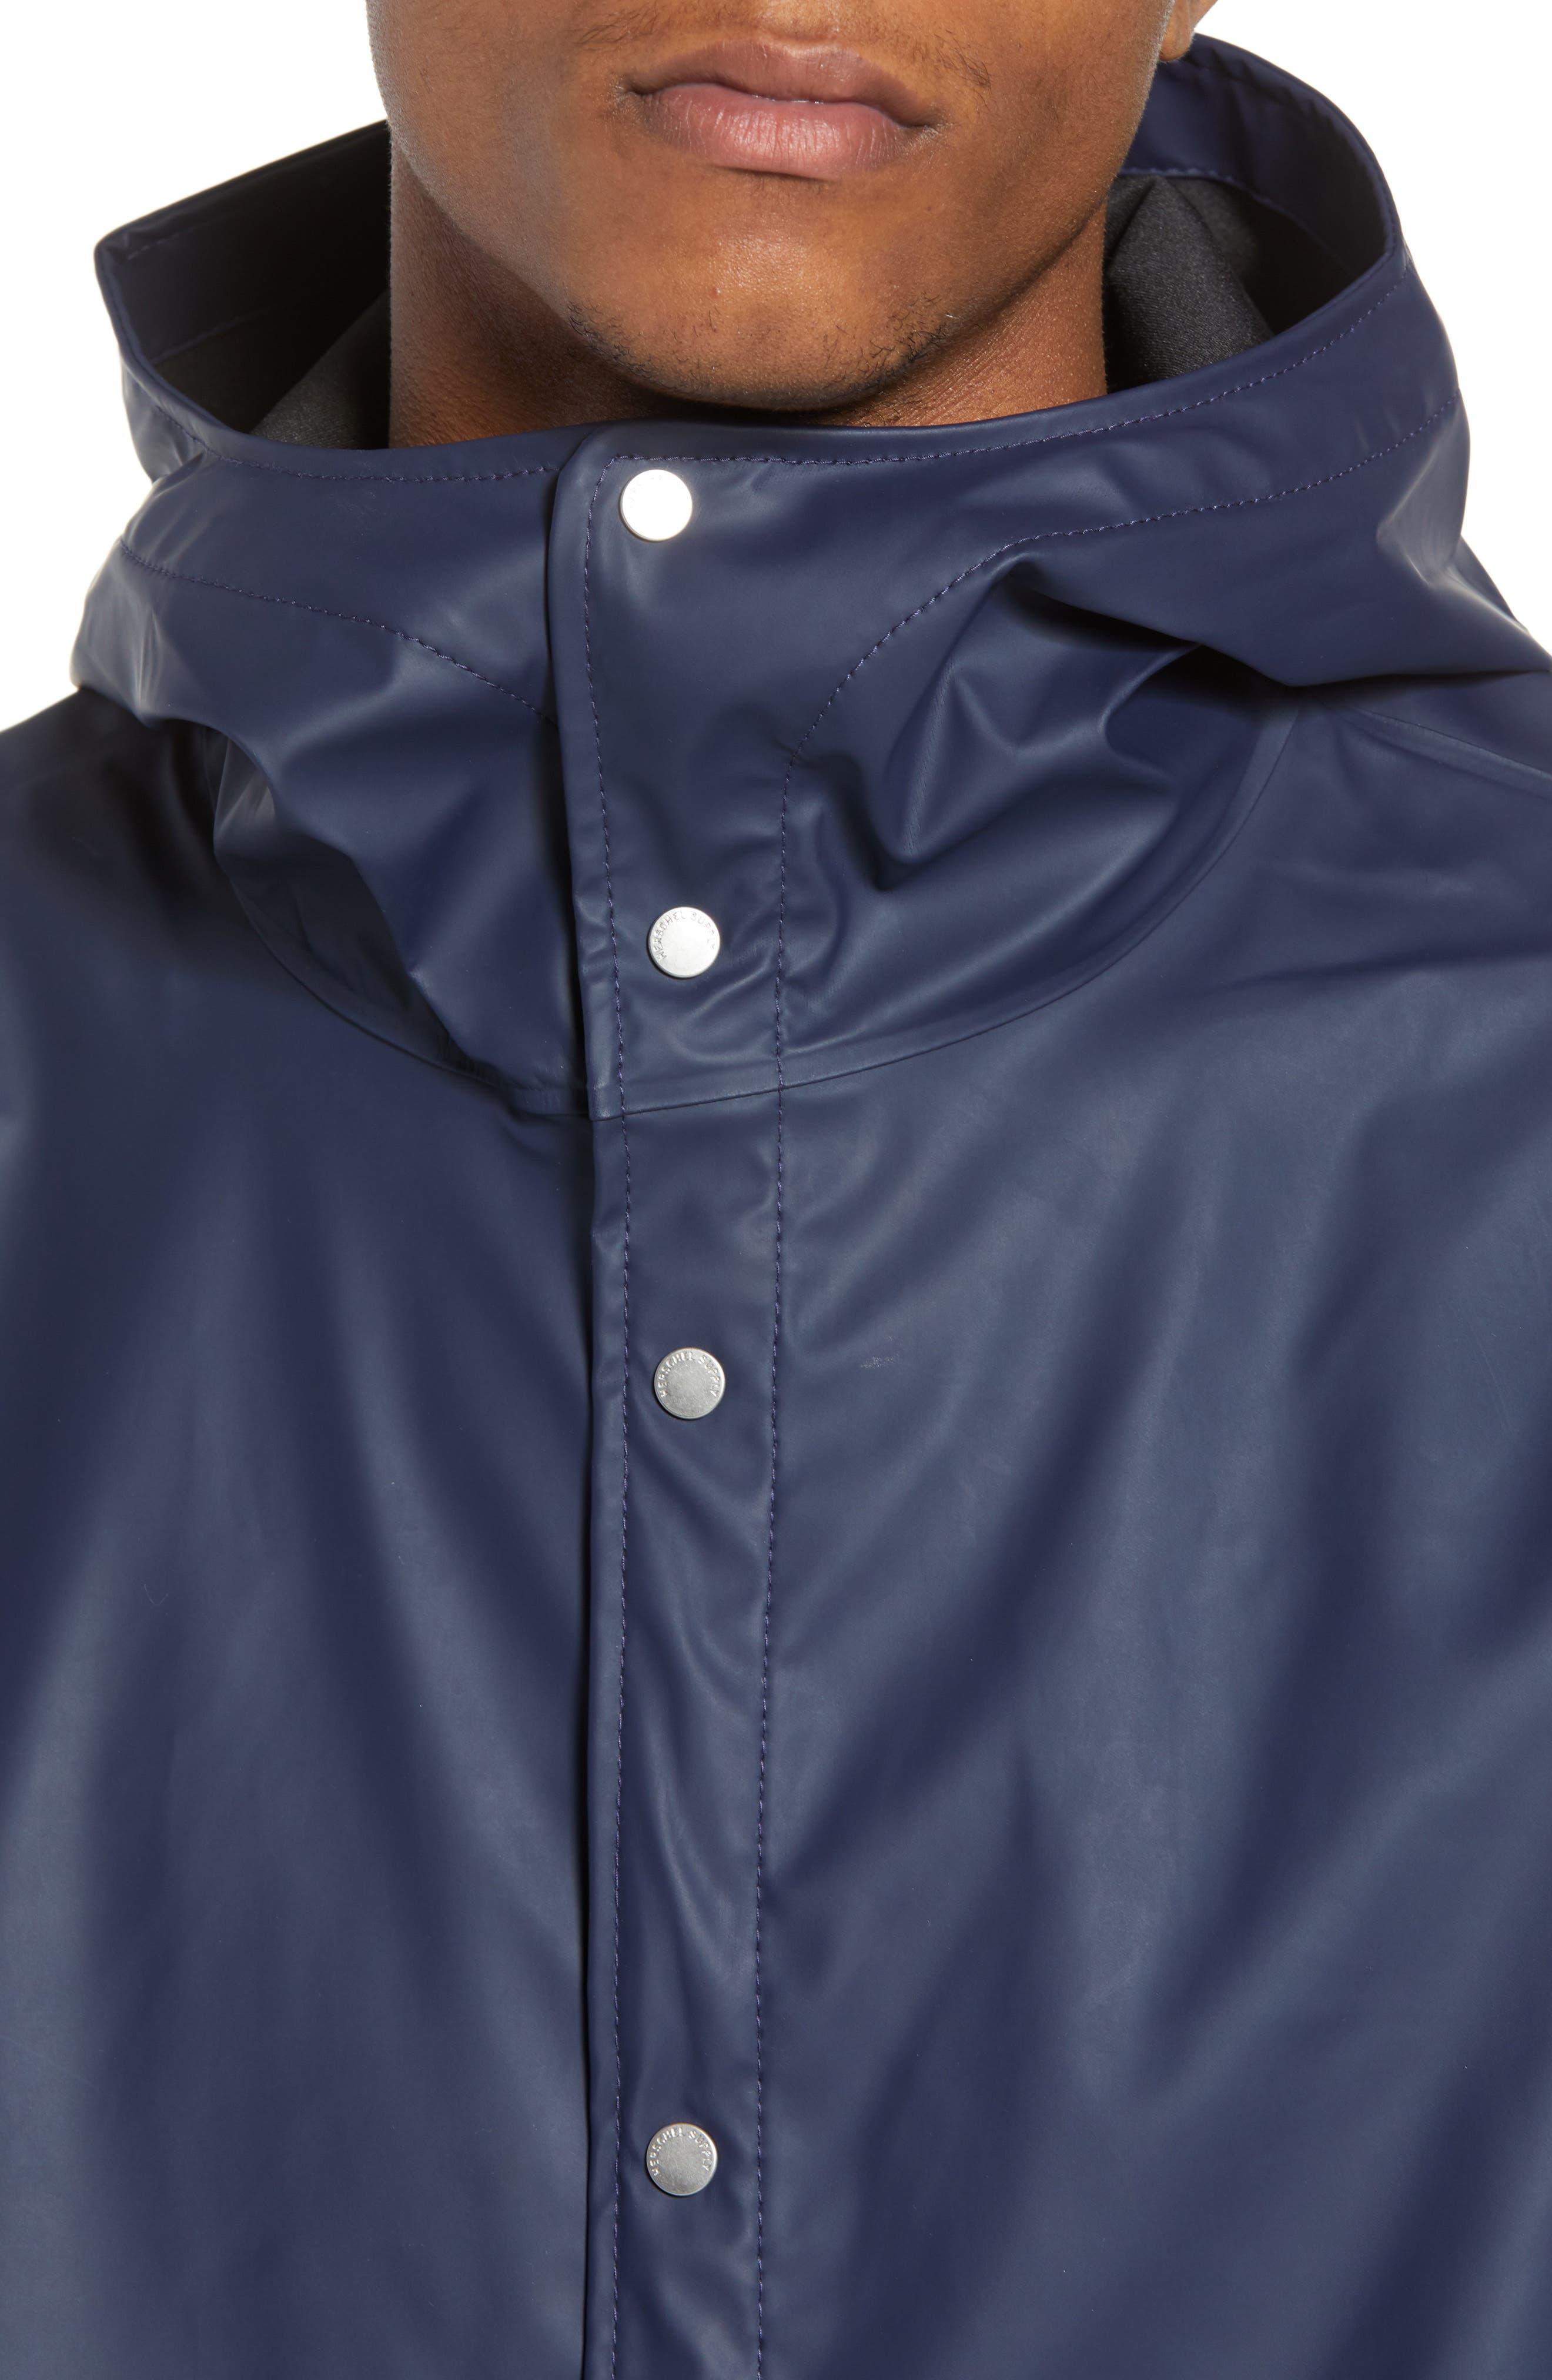 Forecast Hooded Coaches Jacket,                             Alternate thumbnail 4, color,                             Peacoat/ Peacoat